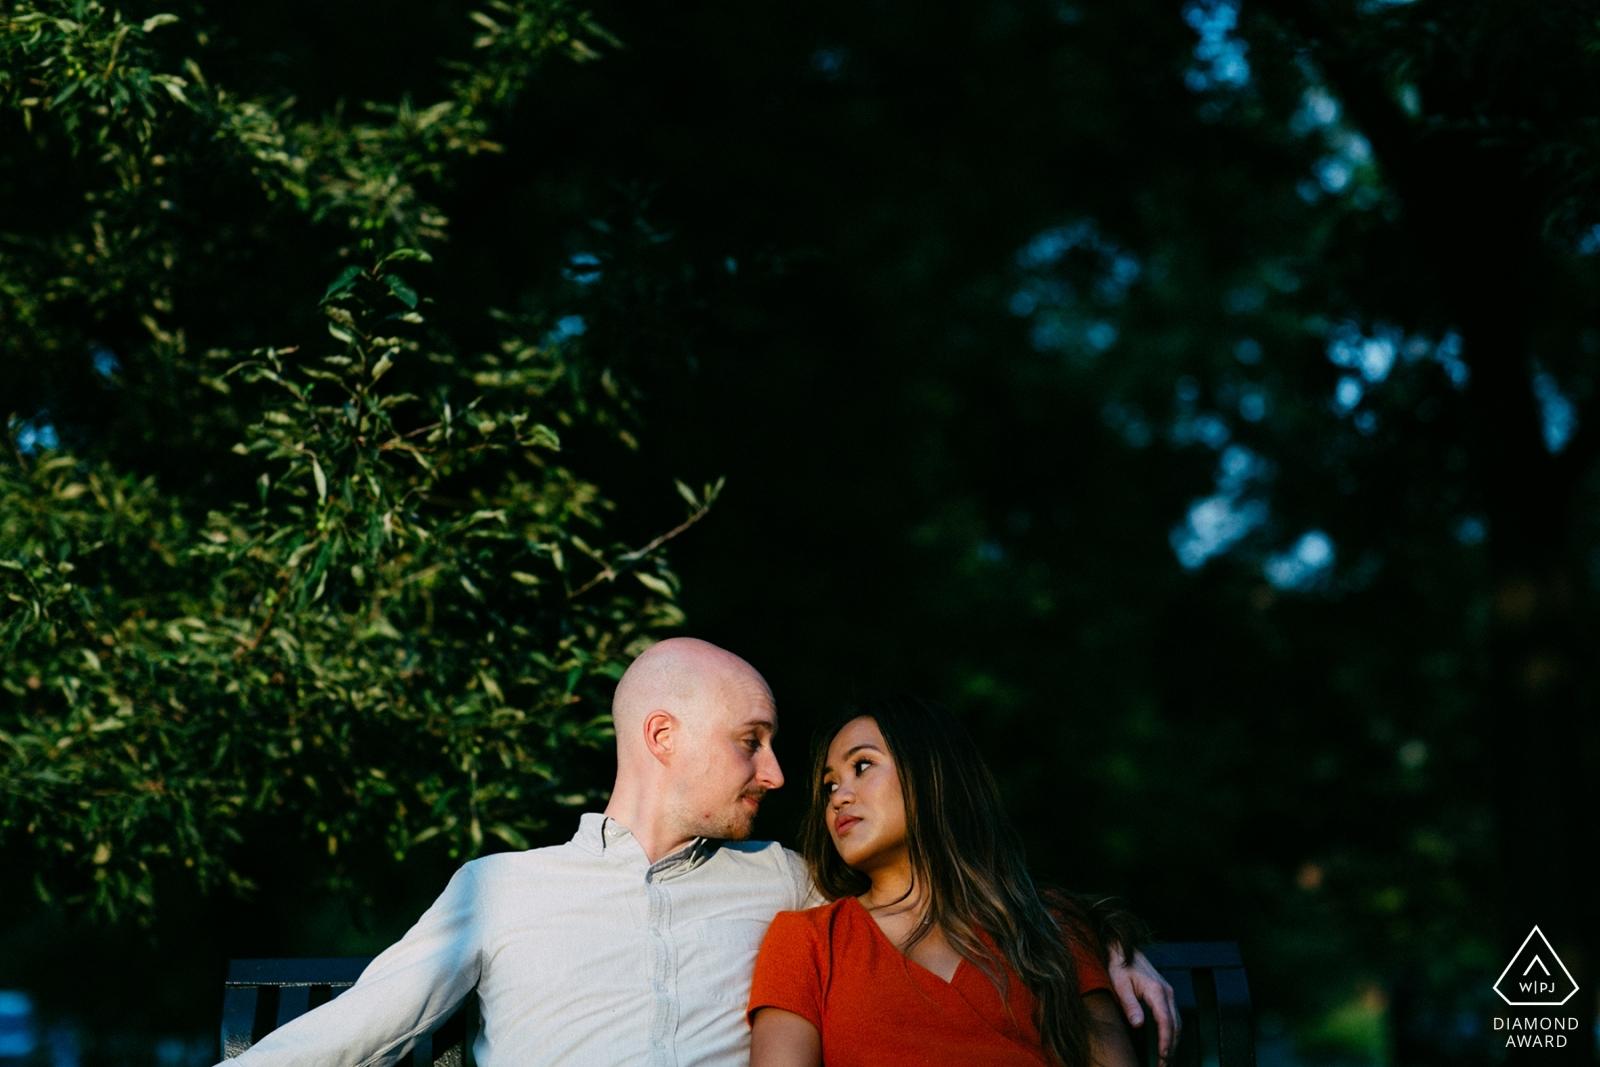 pre-wedding-portrait-photographers-2538201.jpg